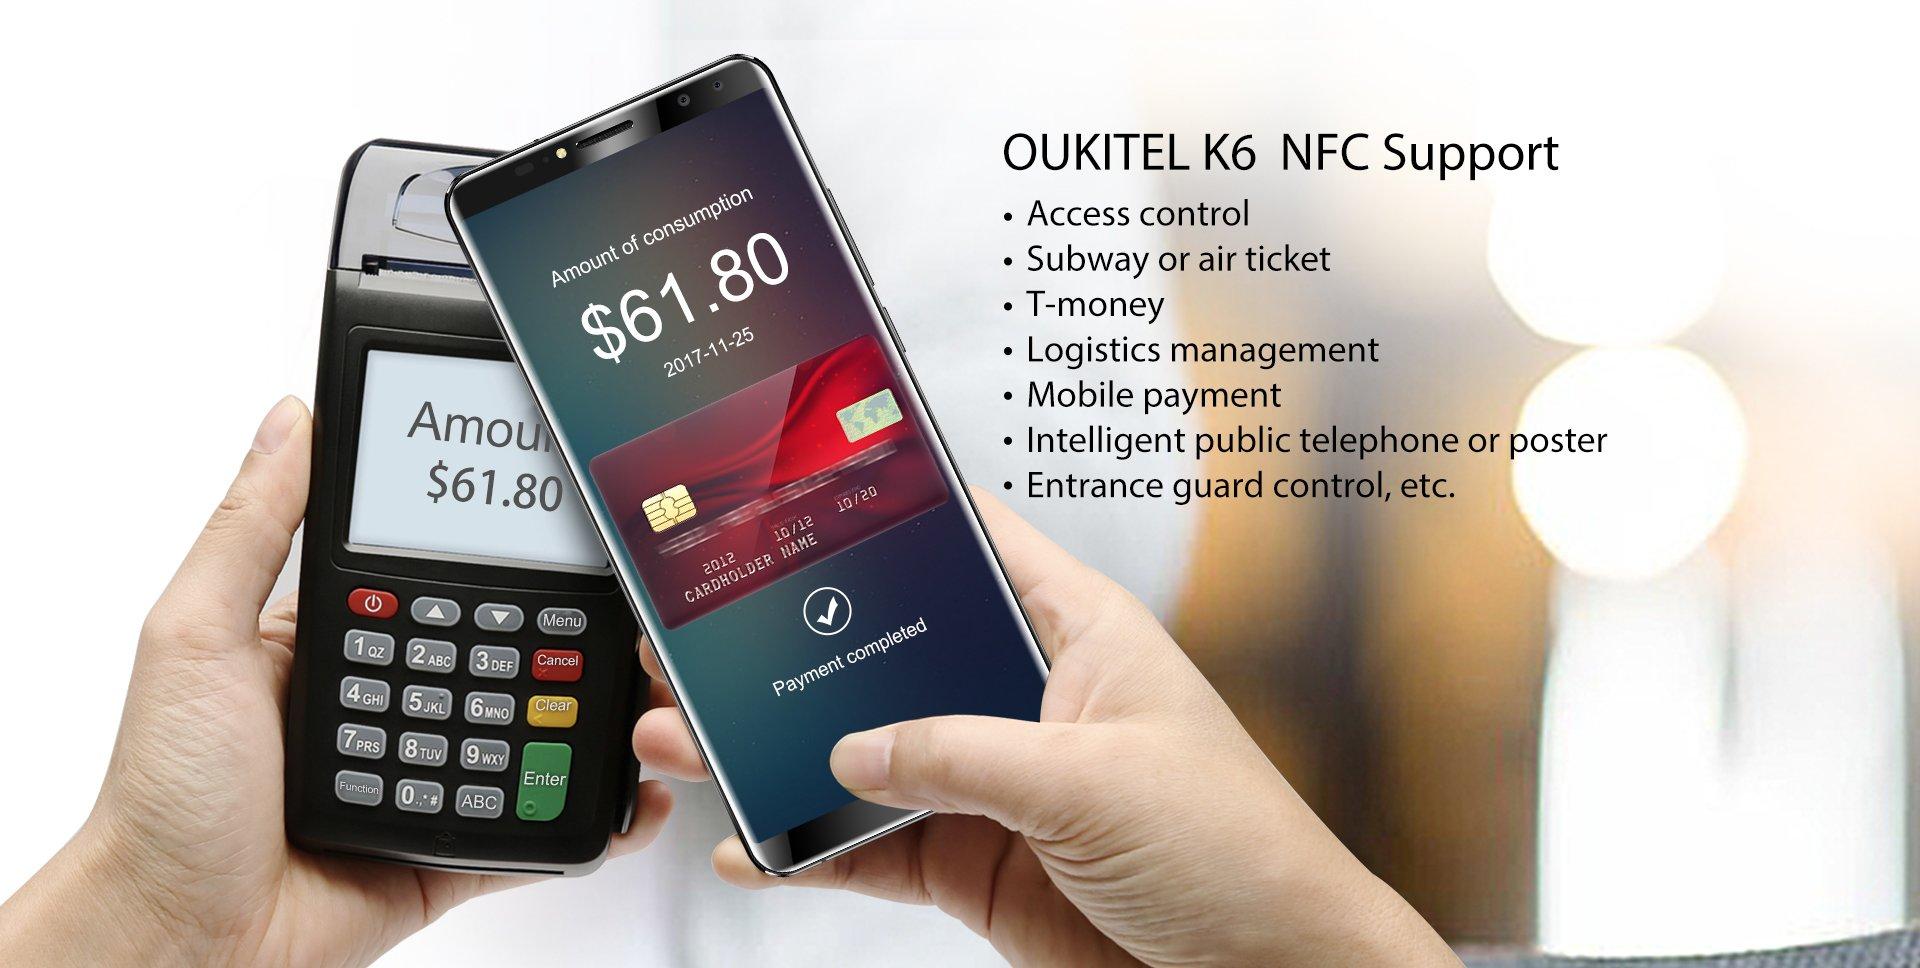 OUKITEL K6